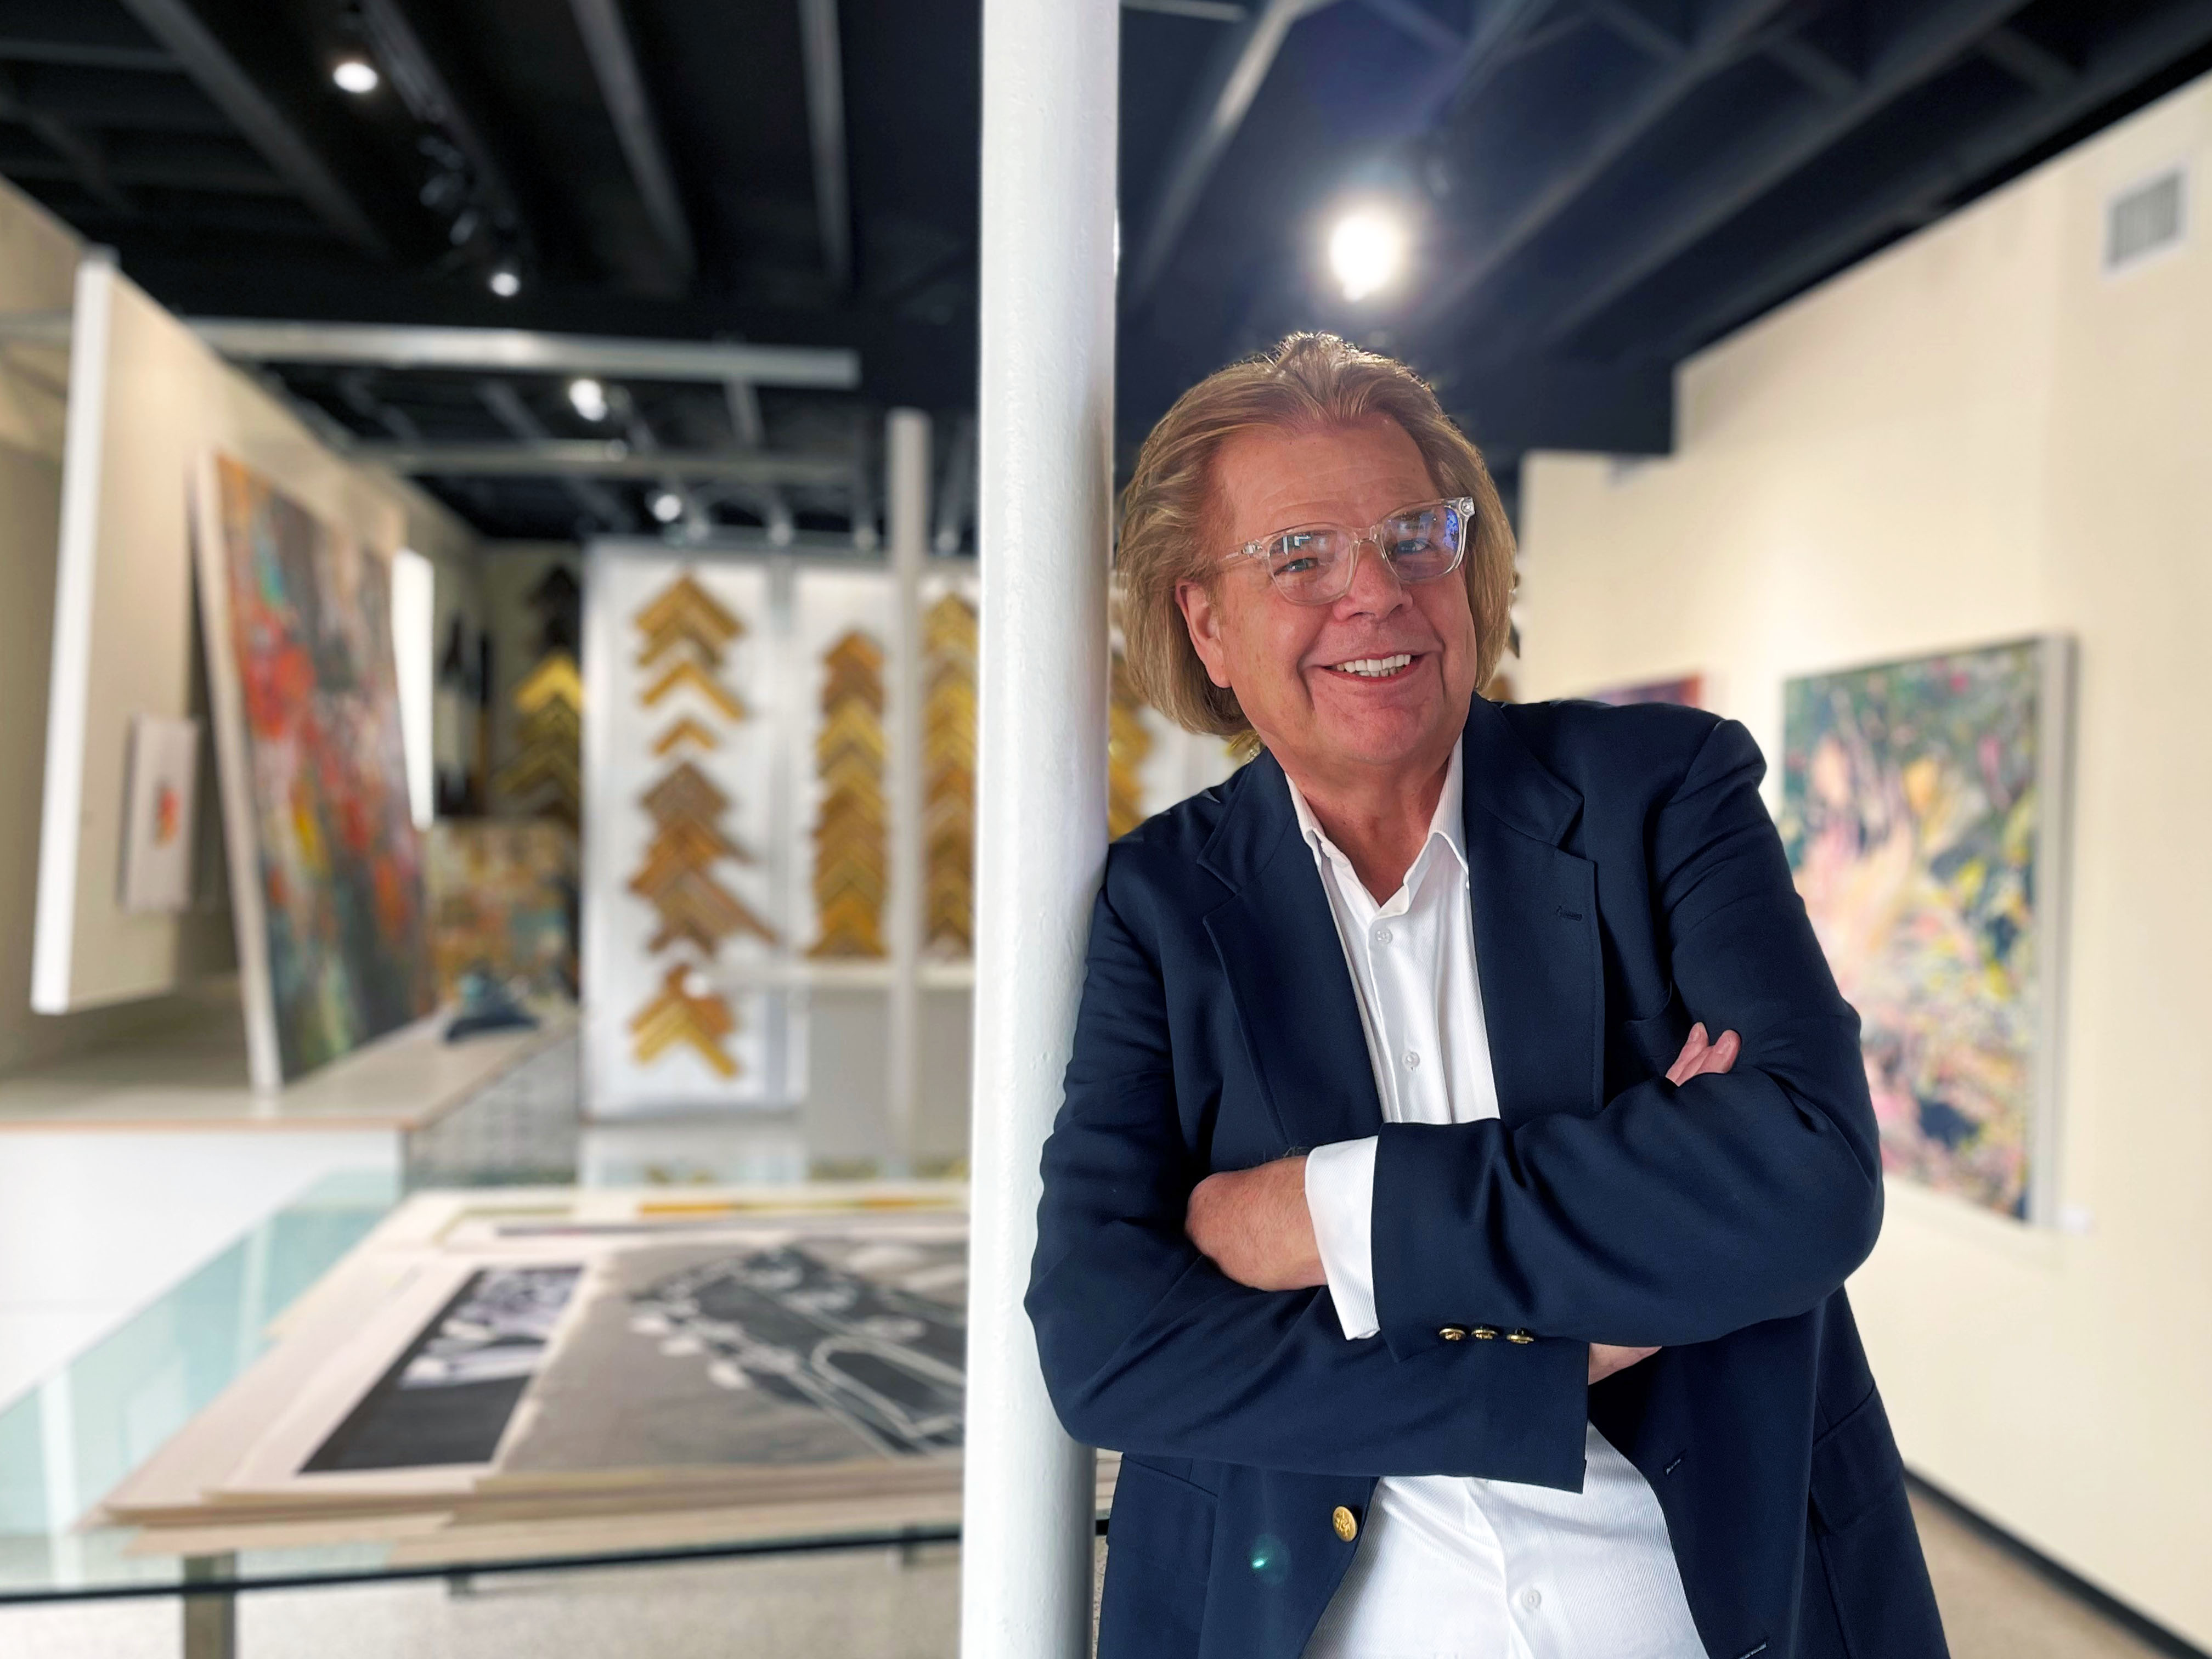 Gallery owner Michael Murphy